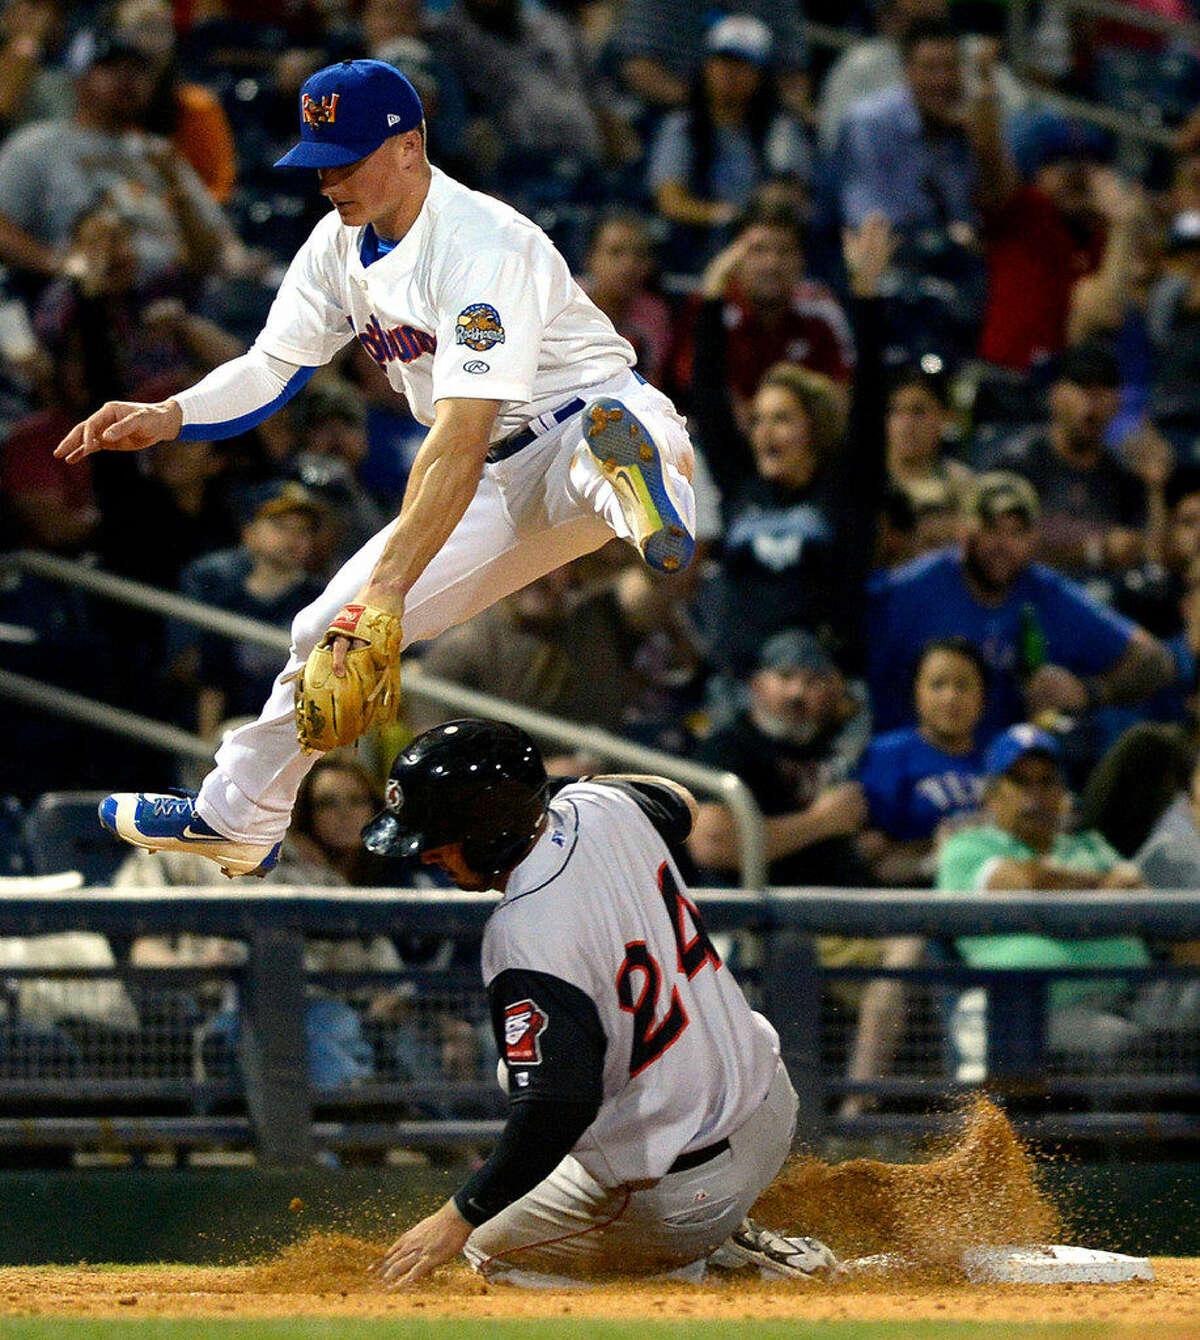 Rockhounds third baseman Matt Chapman (7) leaps over Arkansas' Eric Aguilera after tagging the base for an out during the Rockhounds season home opener Thursday, April 14, 2016 at Security Bank Ballpark. James Durbin/Reporter-Telegram